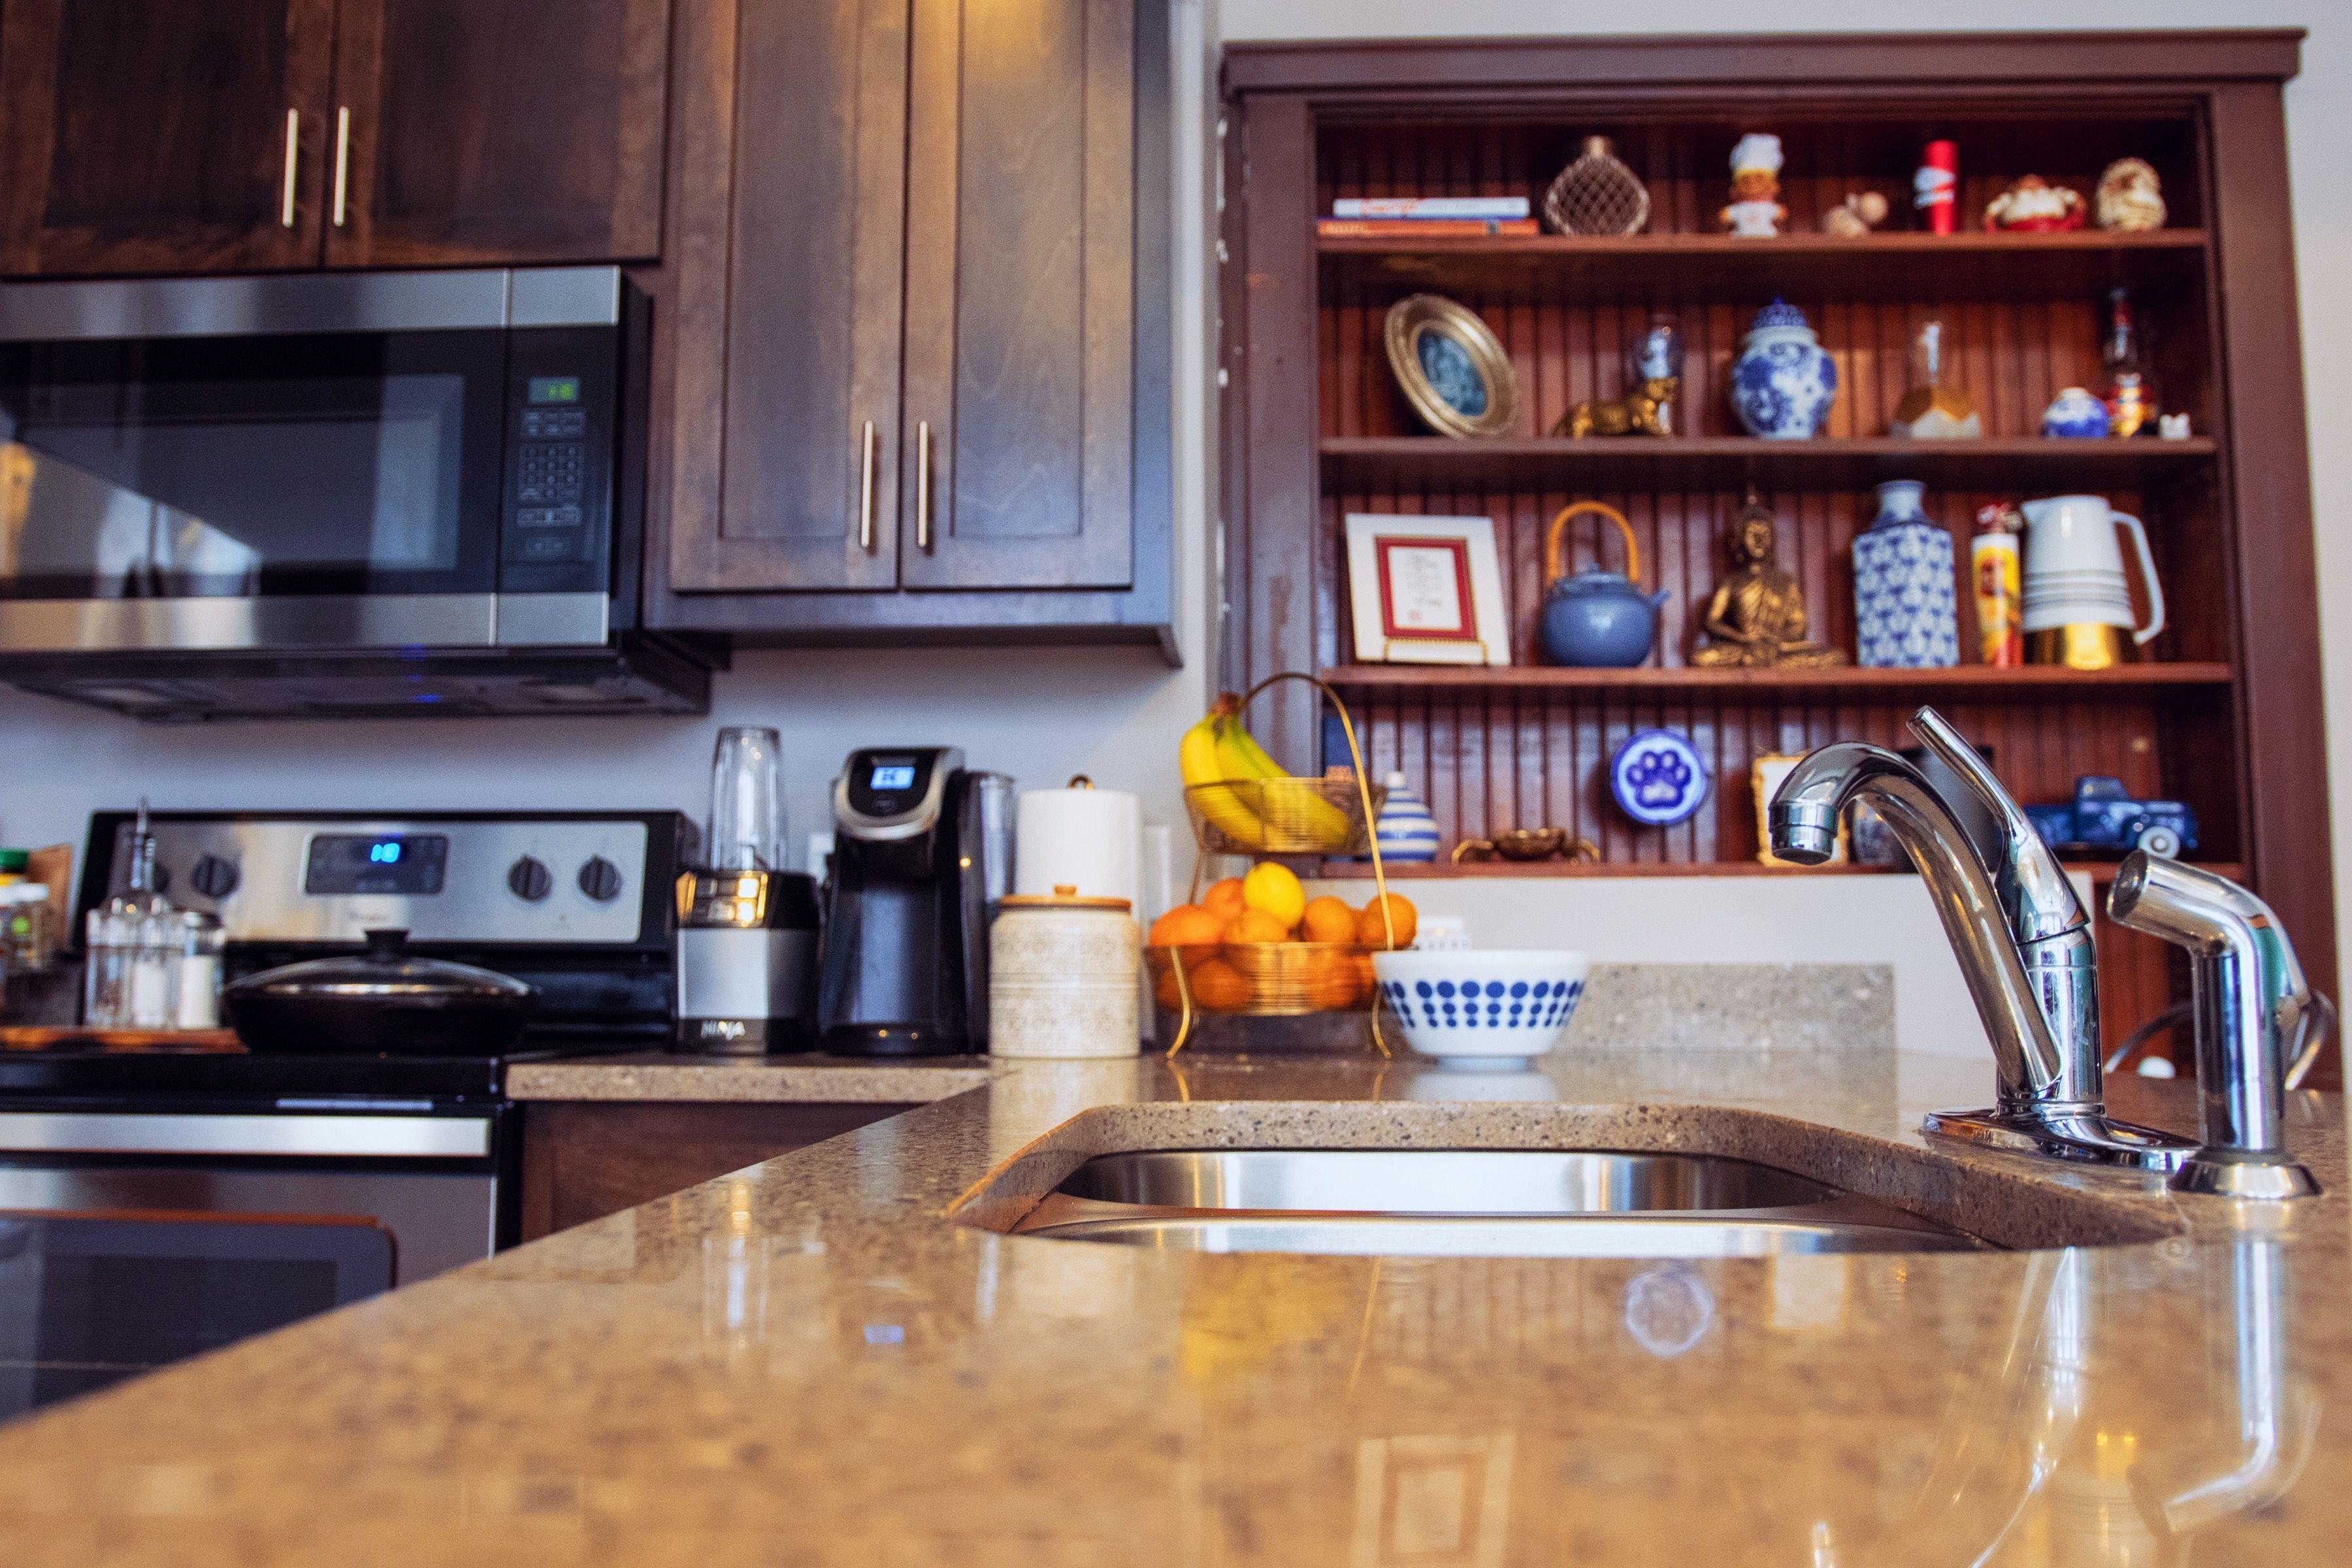 Loft Kitchen In 2020 Loft Kitchen Kitchen Kitchen Cabinets